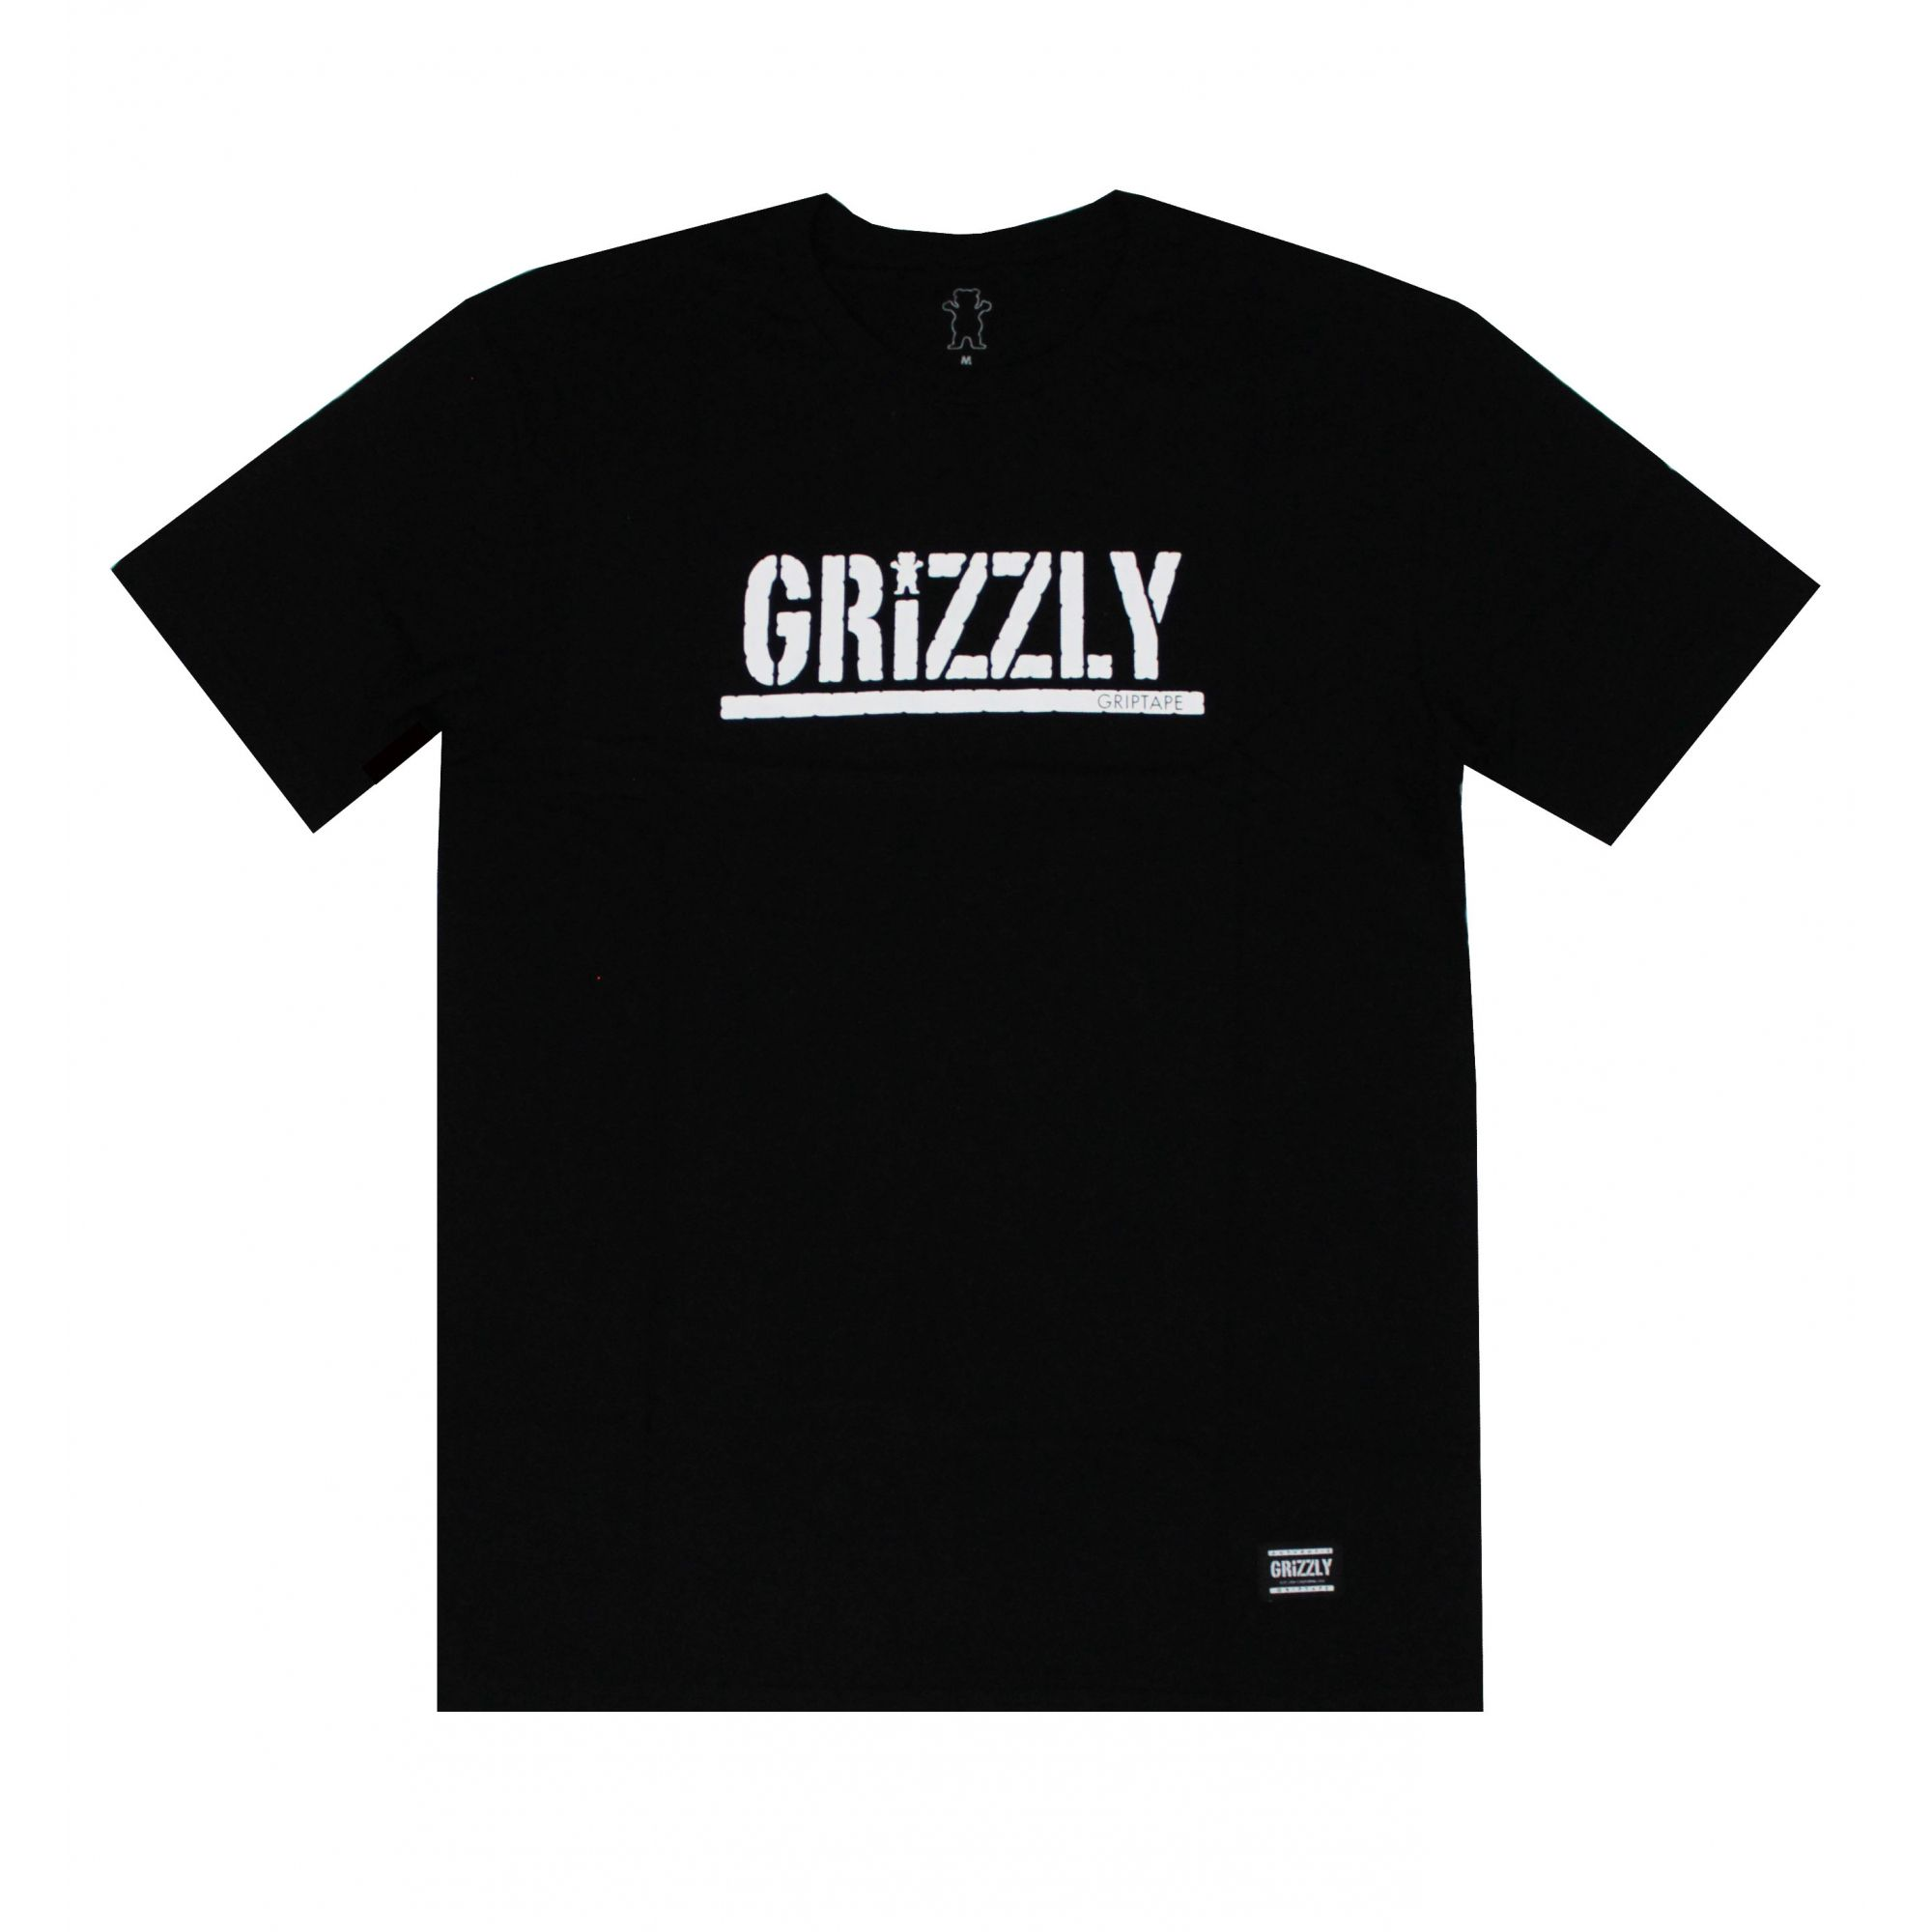 Camiseta Grizzly Classic Stamped - Preto/Branco